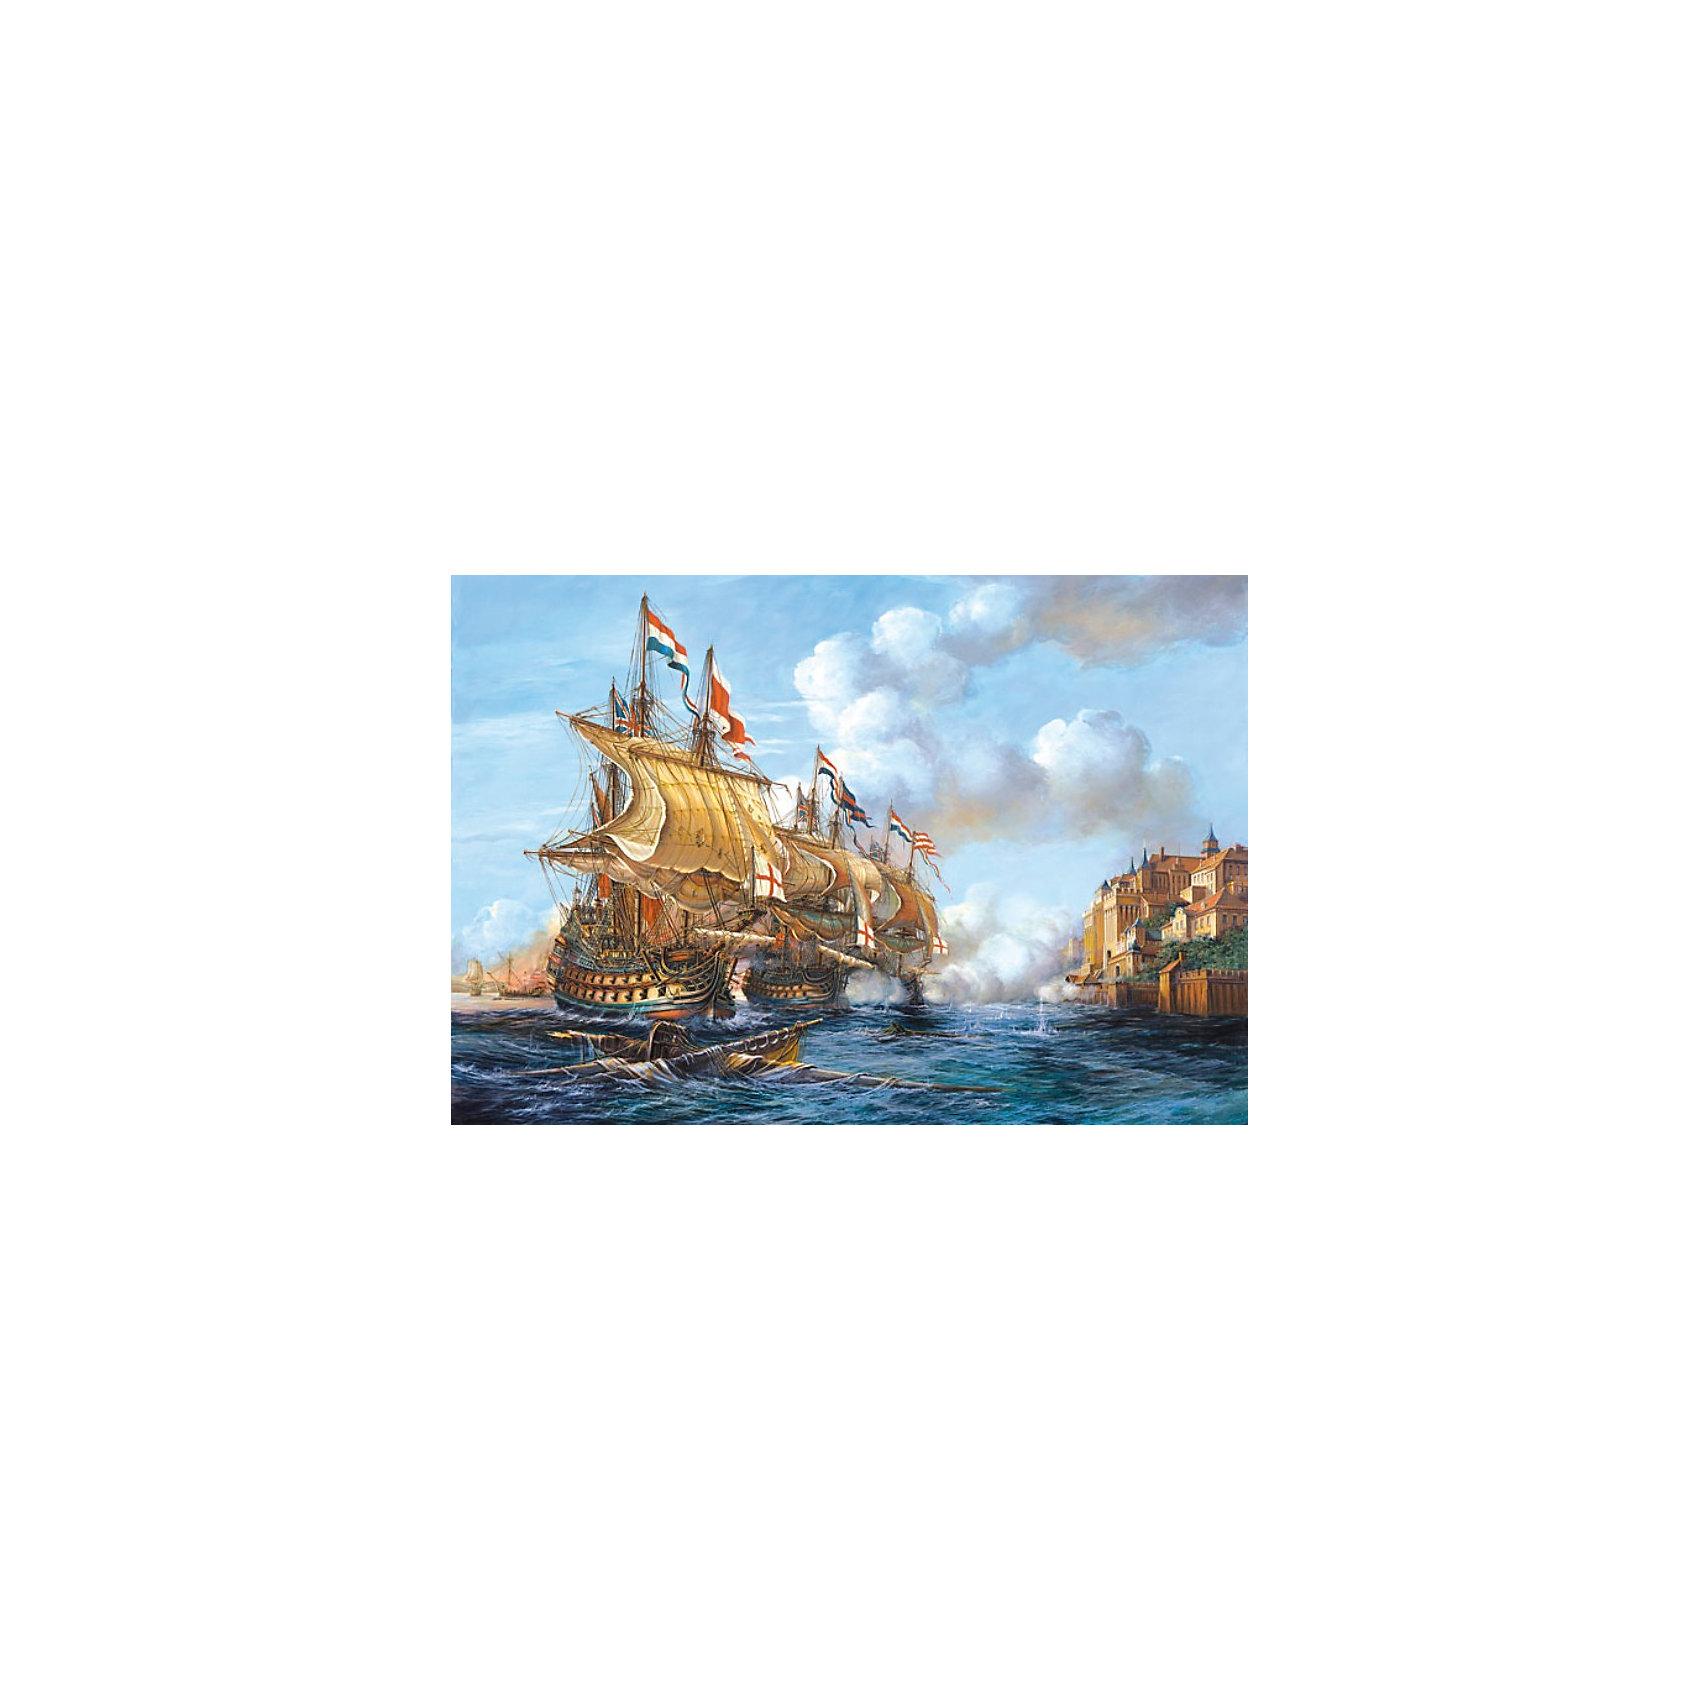 Castorland Пазл Битва при Порто Белло, 2000 деталей, Castorland пазл 2000 продуктовая лавка 17128